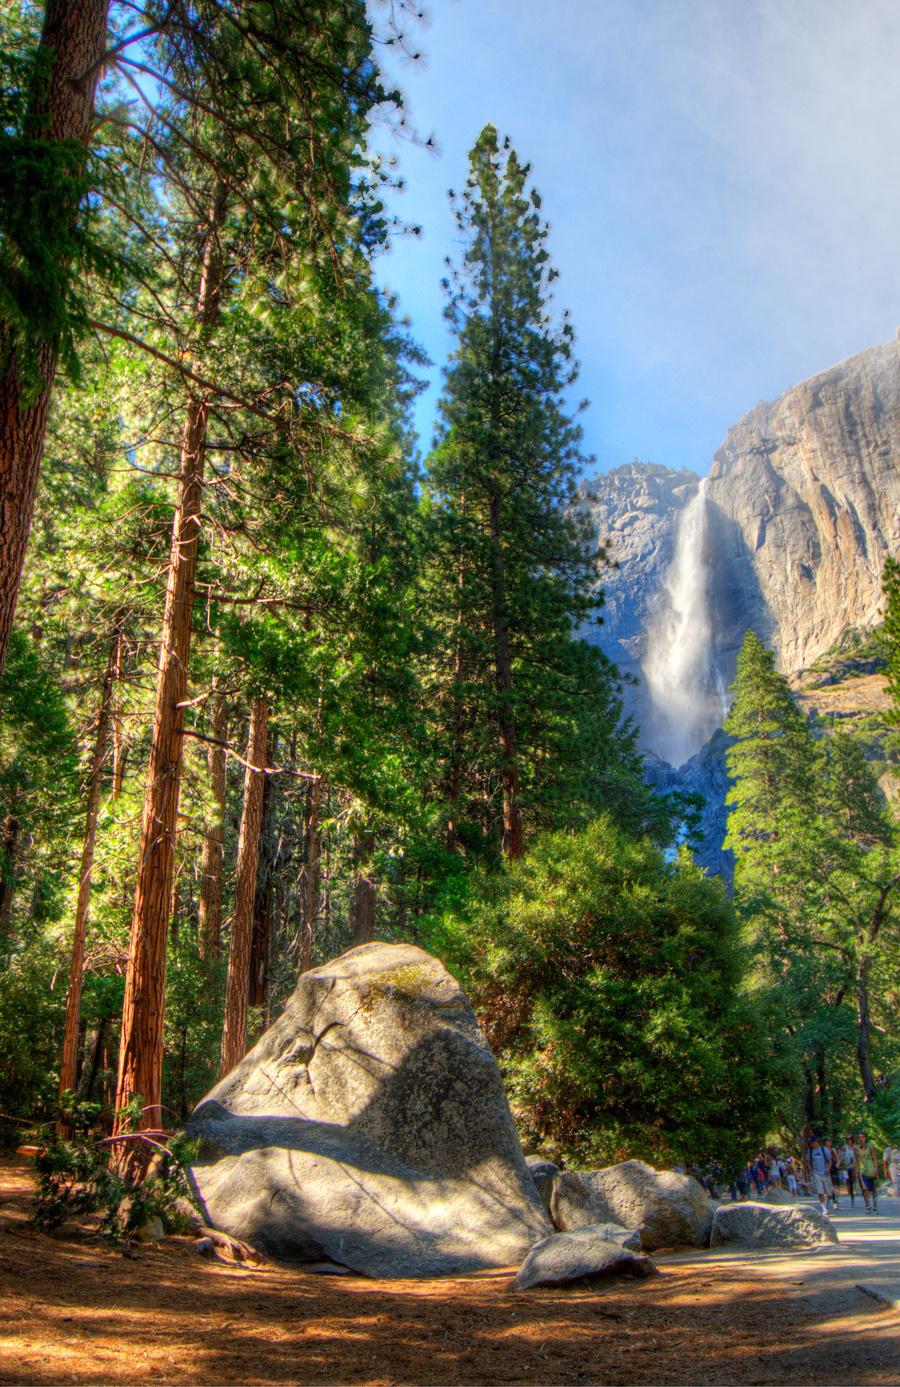 49182-5508634-Halbert_Bai_Yosemite_Falls.jpg